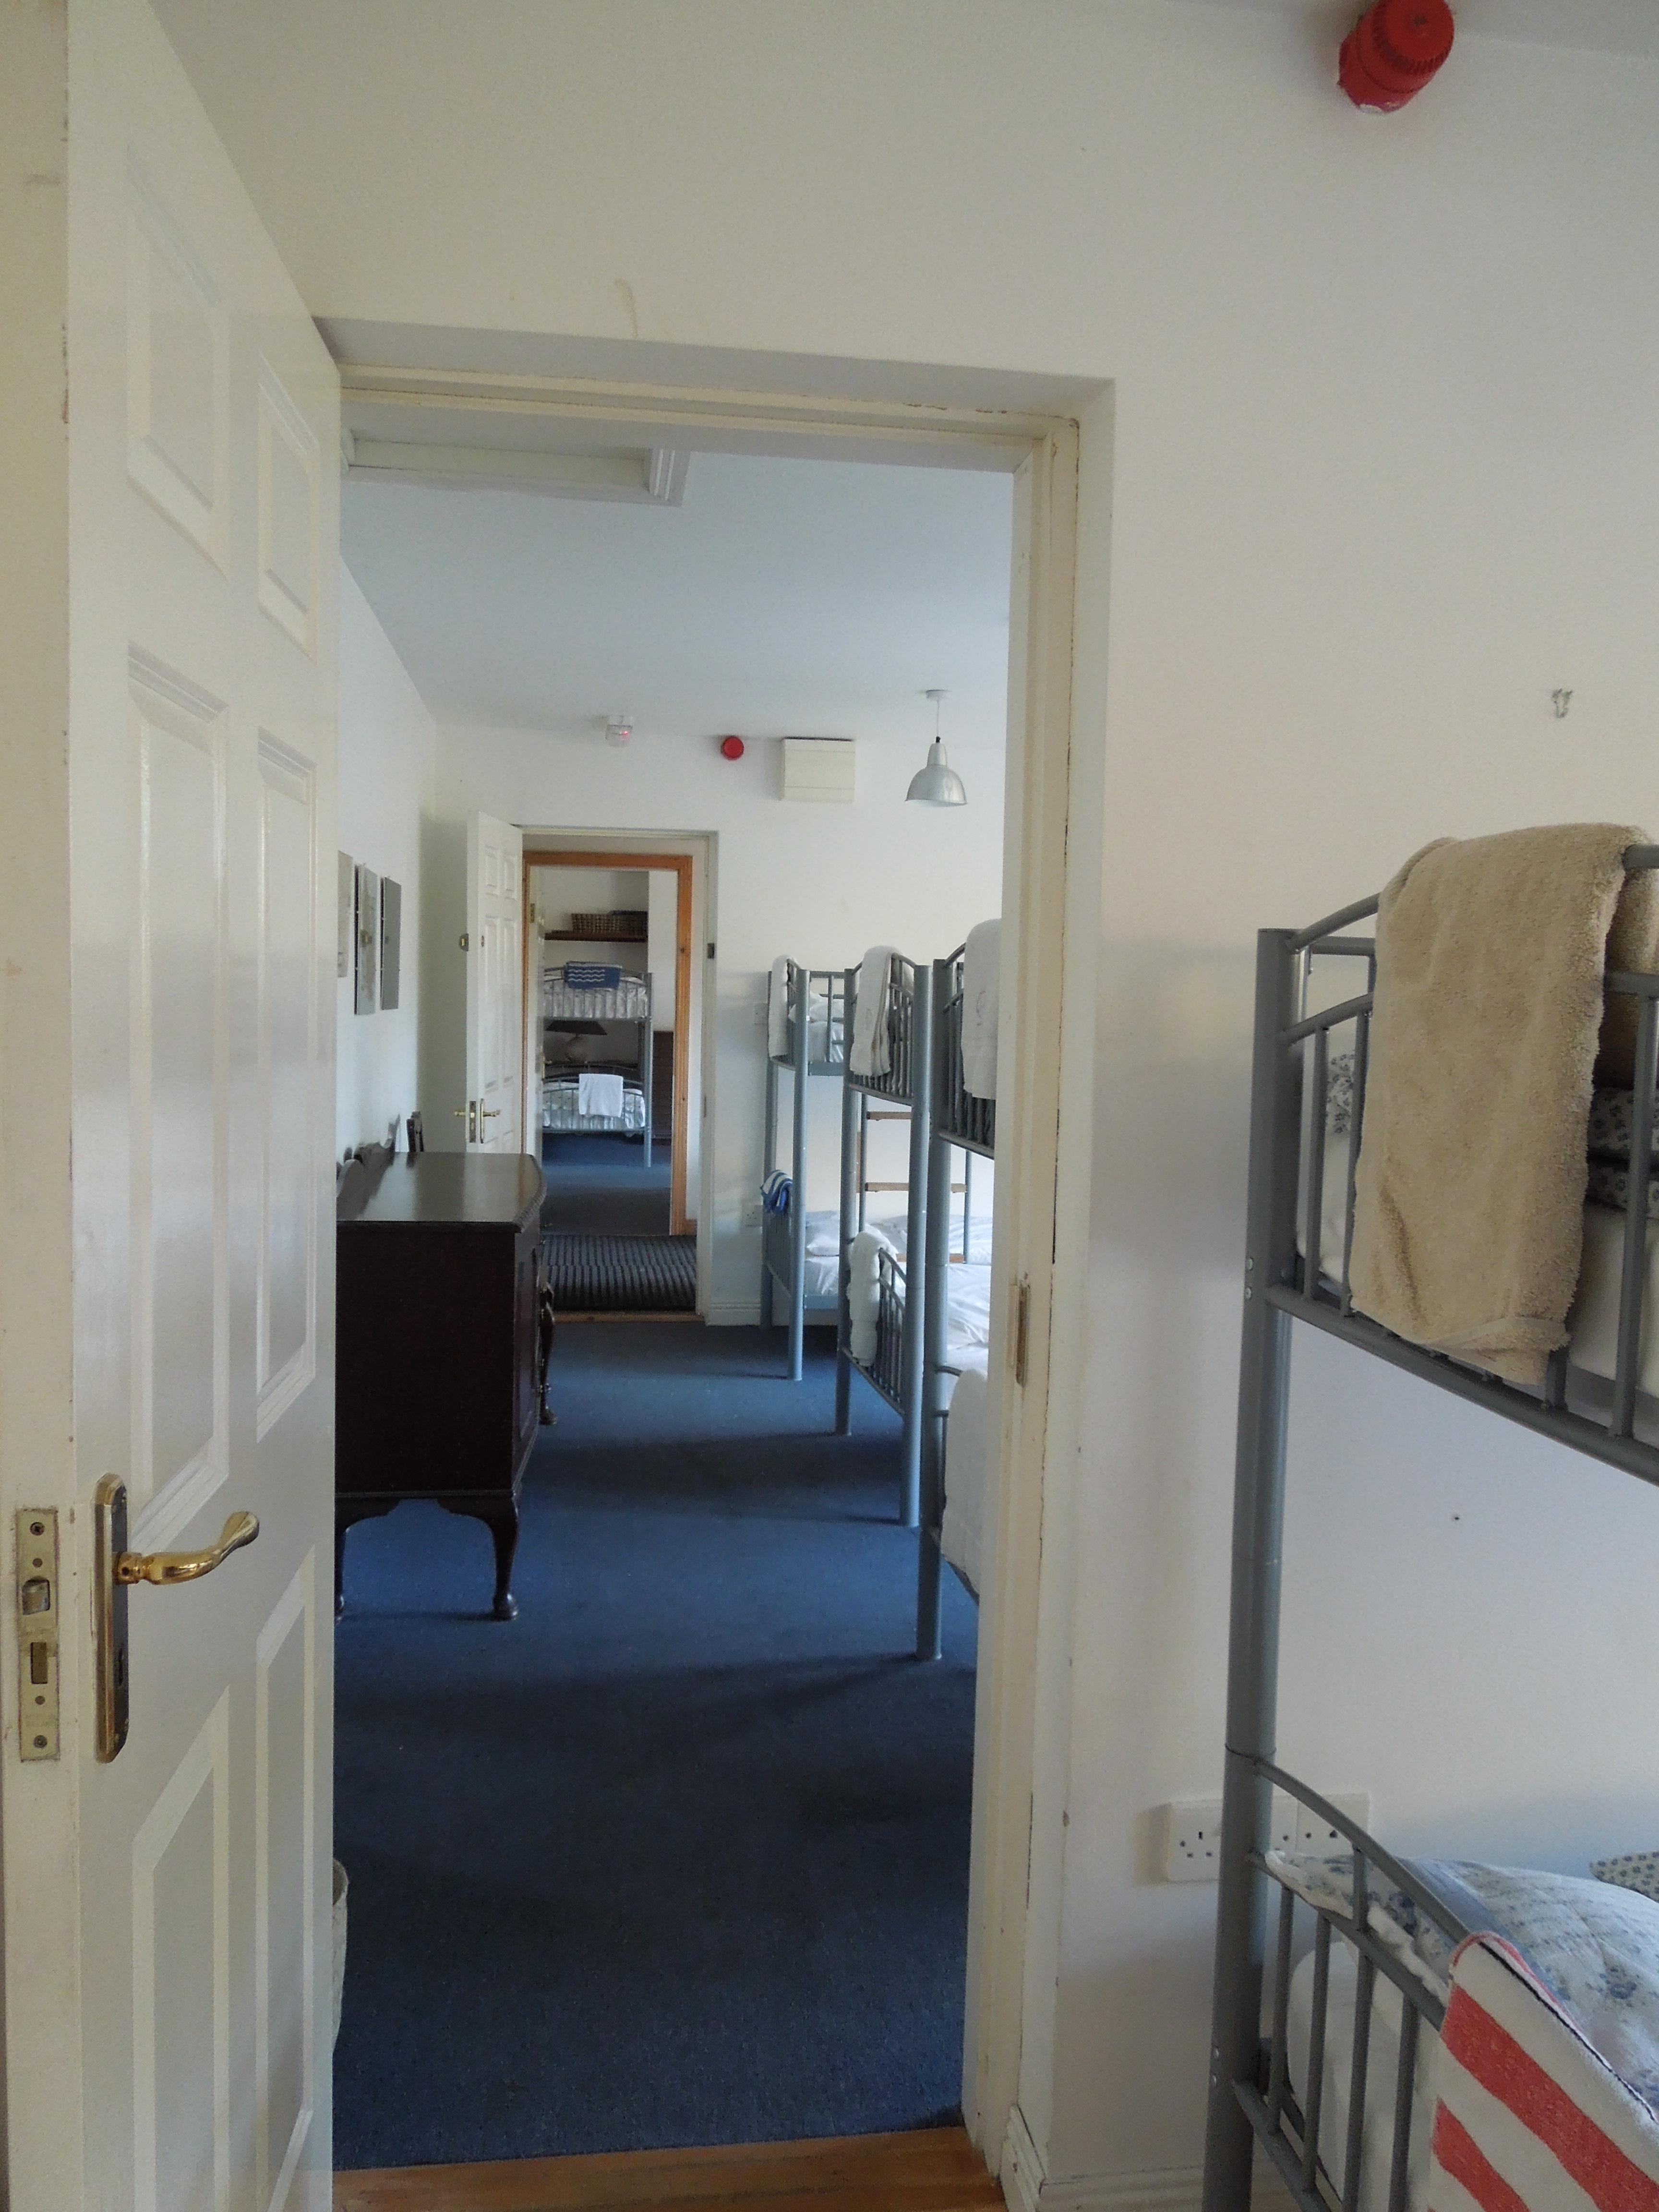 Adjoining dormitories